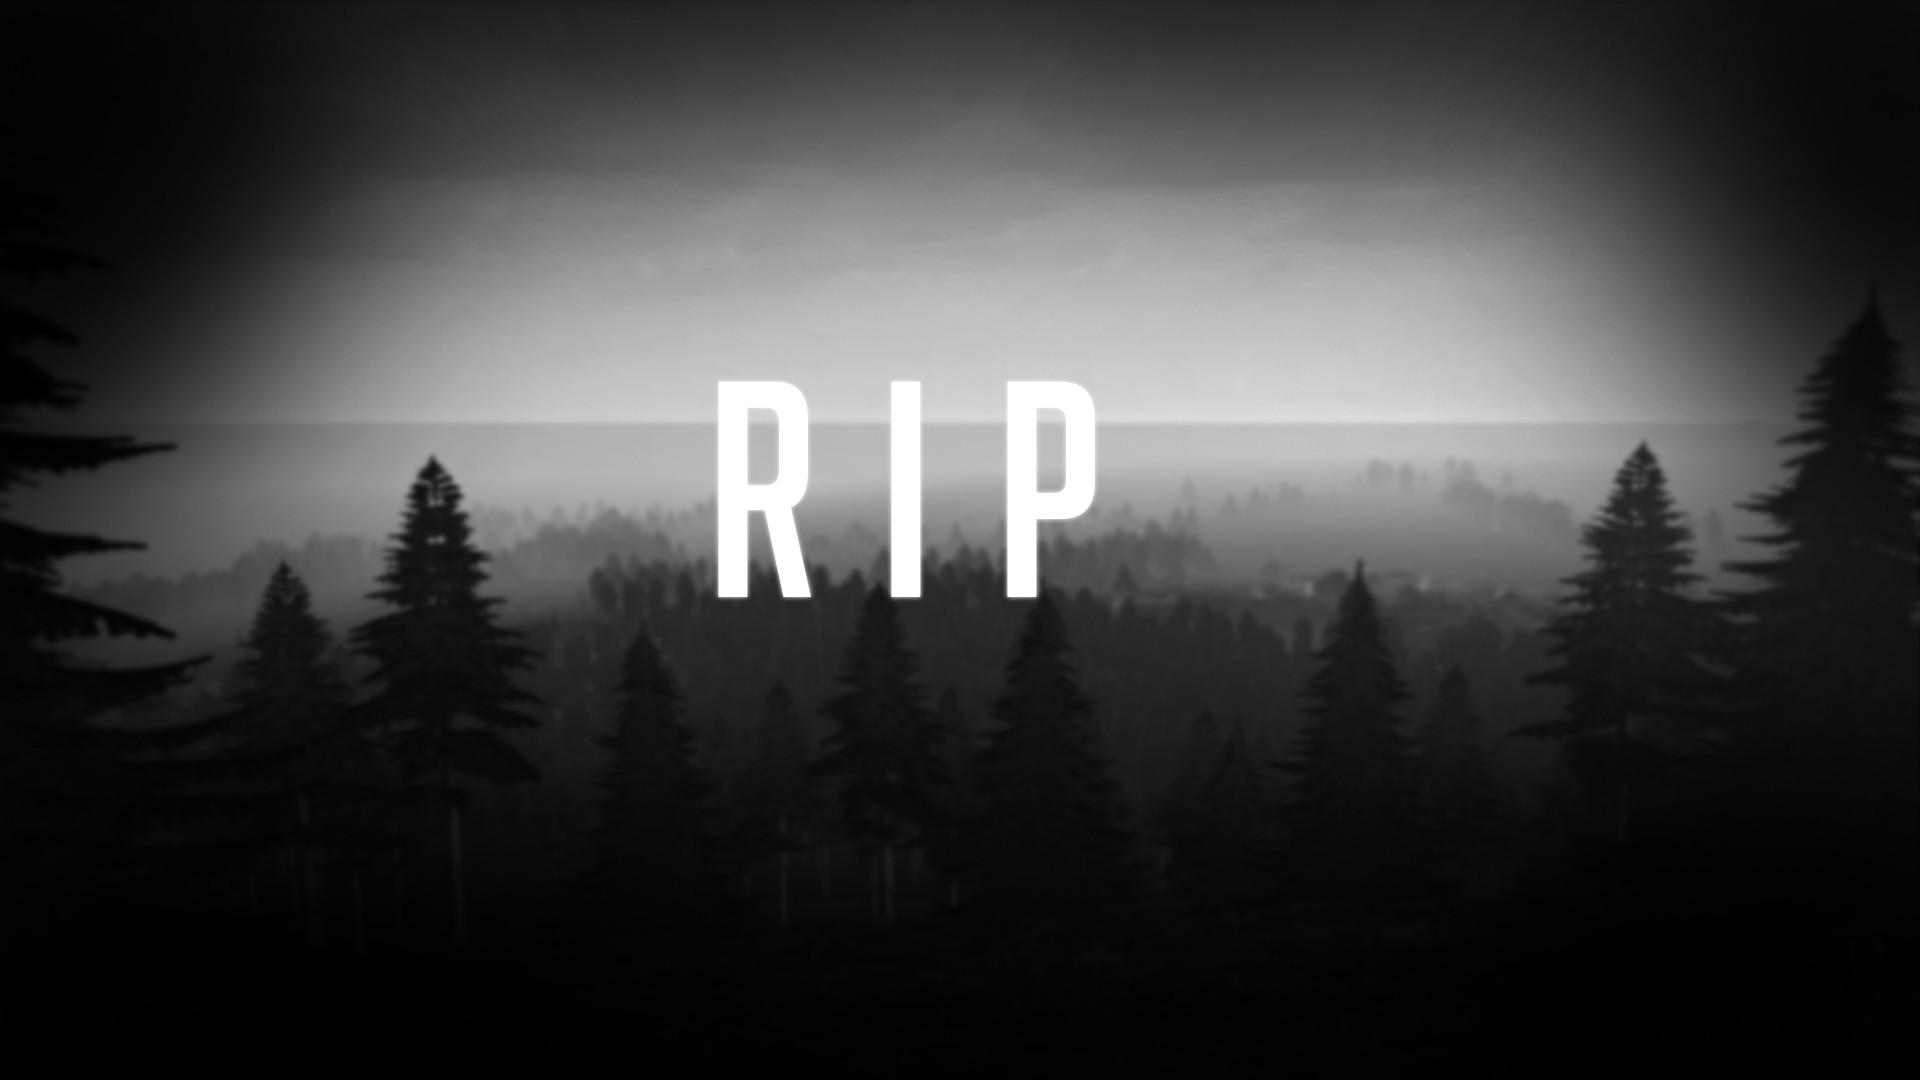 Rest In Peace | HD Pics